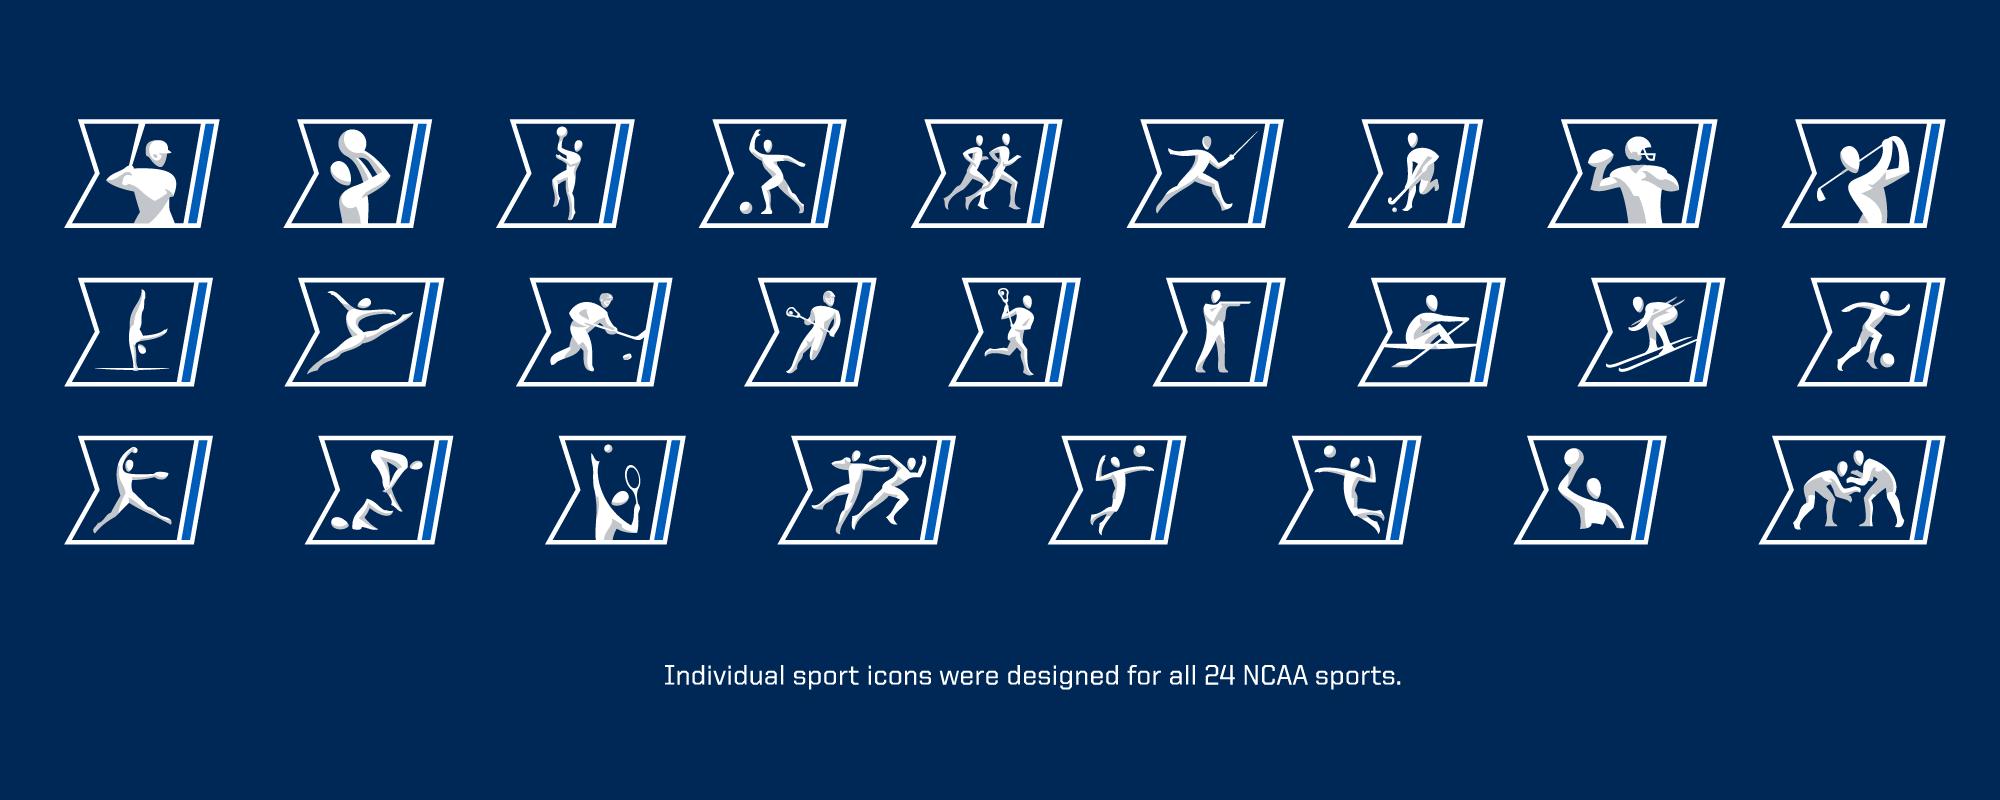 New Logos for NCAA Championships by Joe Bosack & Co